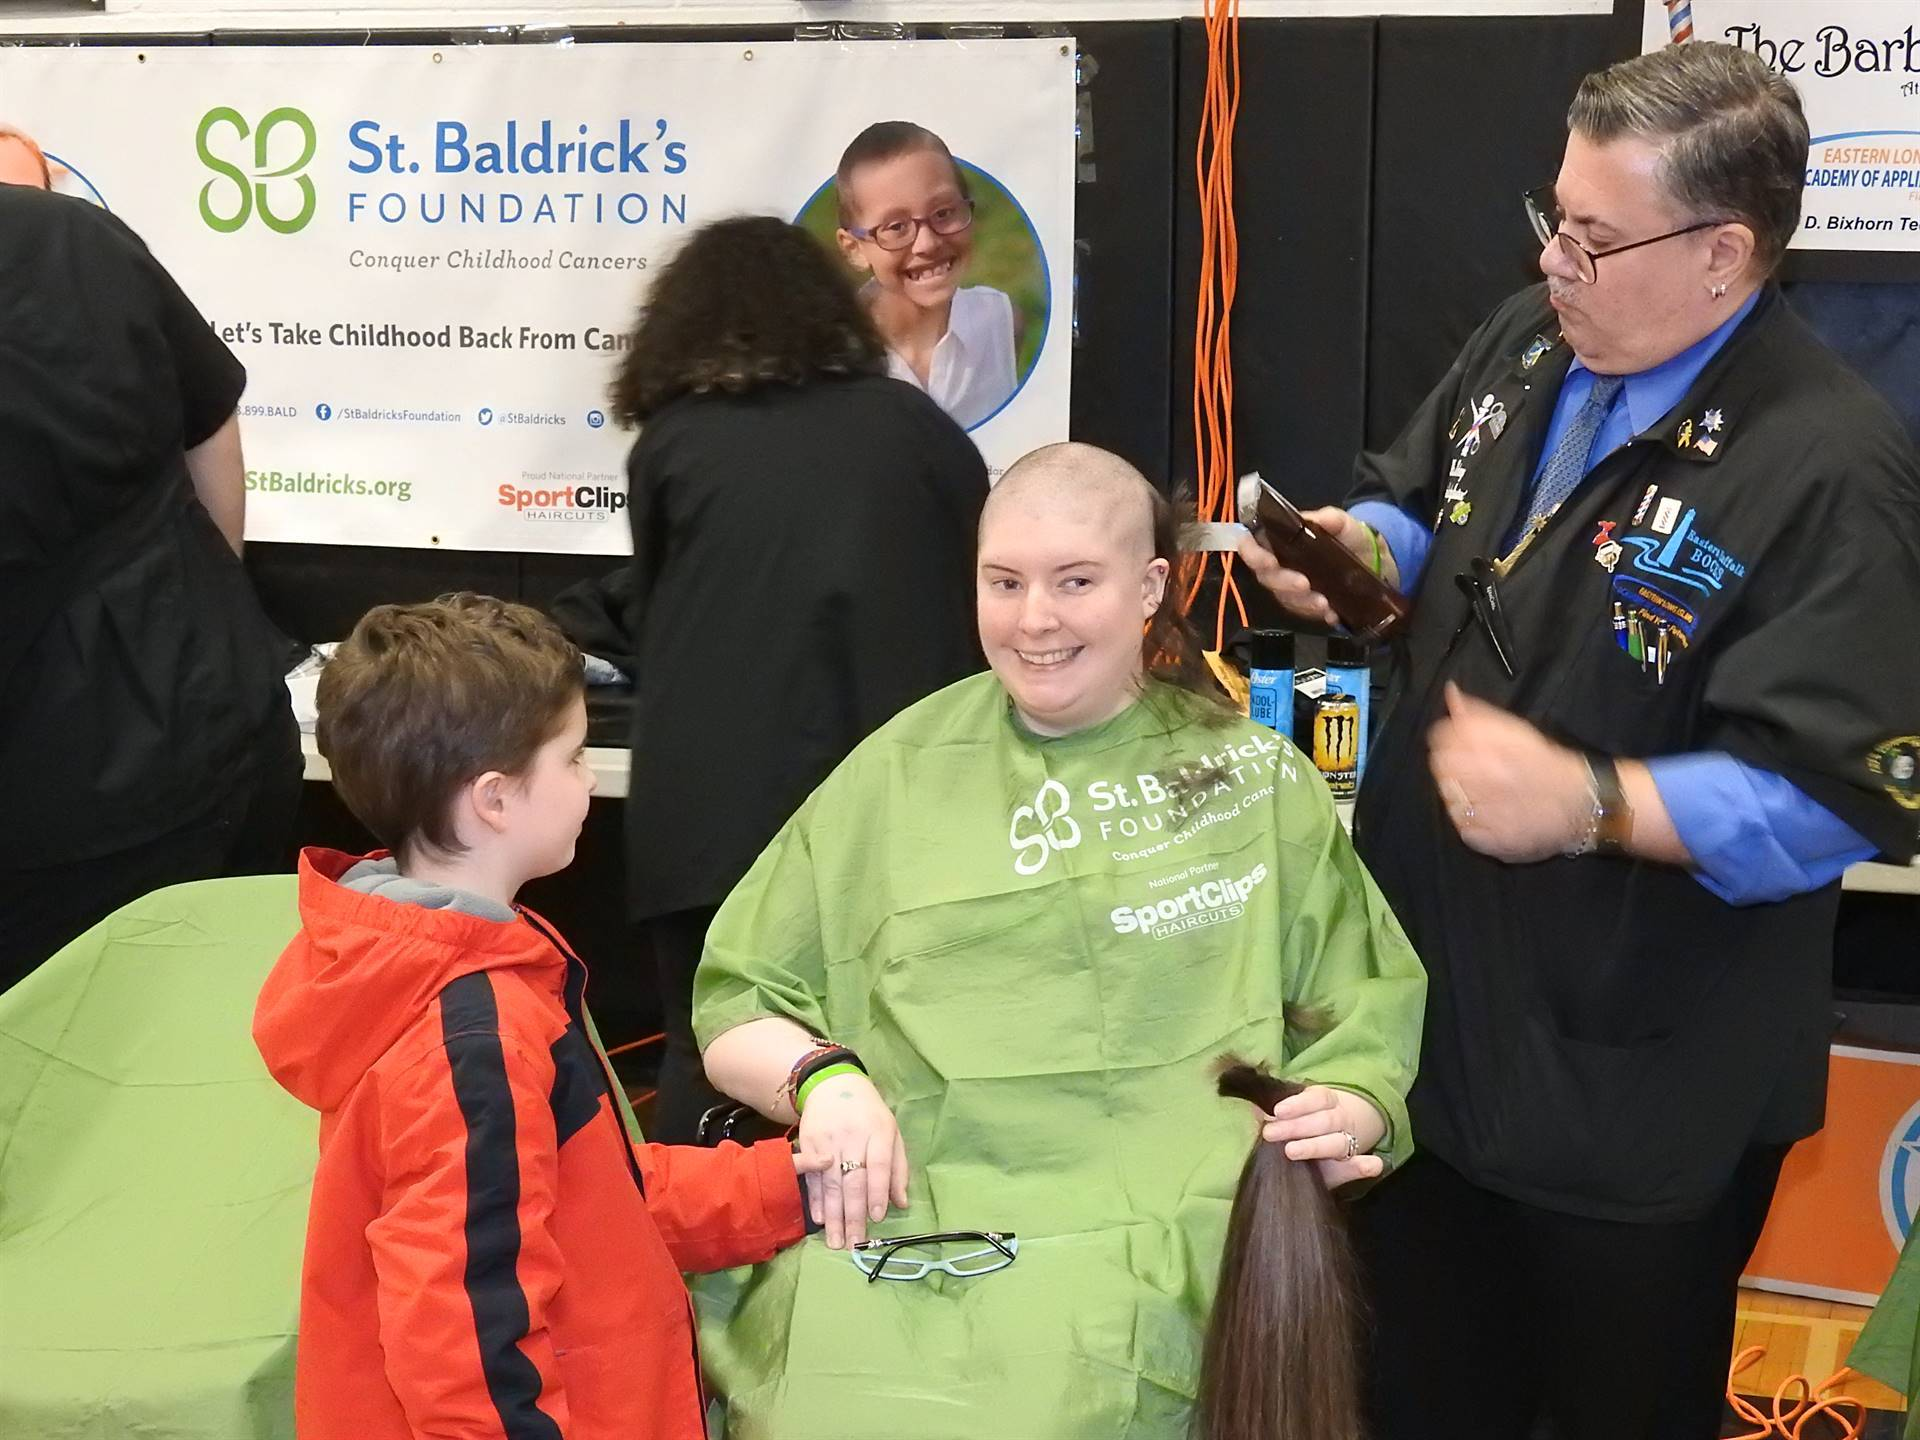 St. Baldrick's 2019